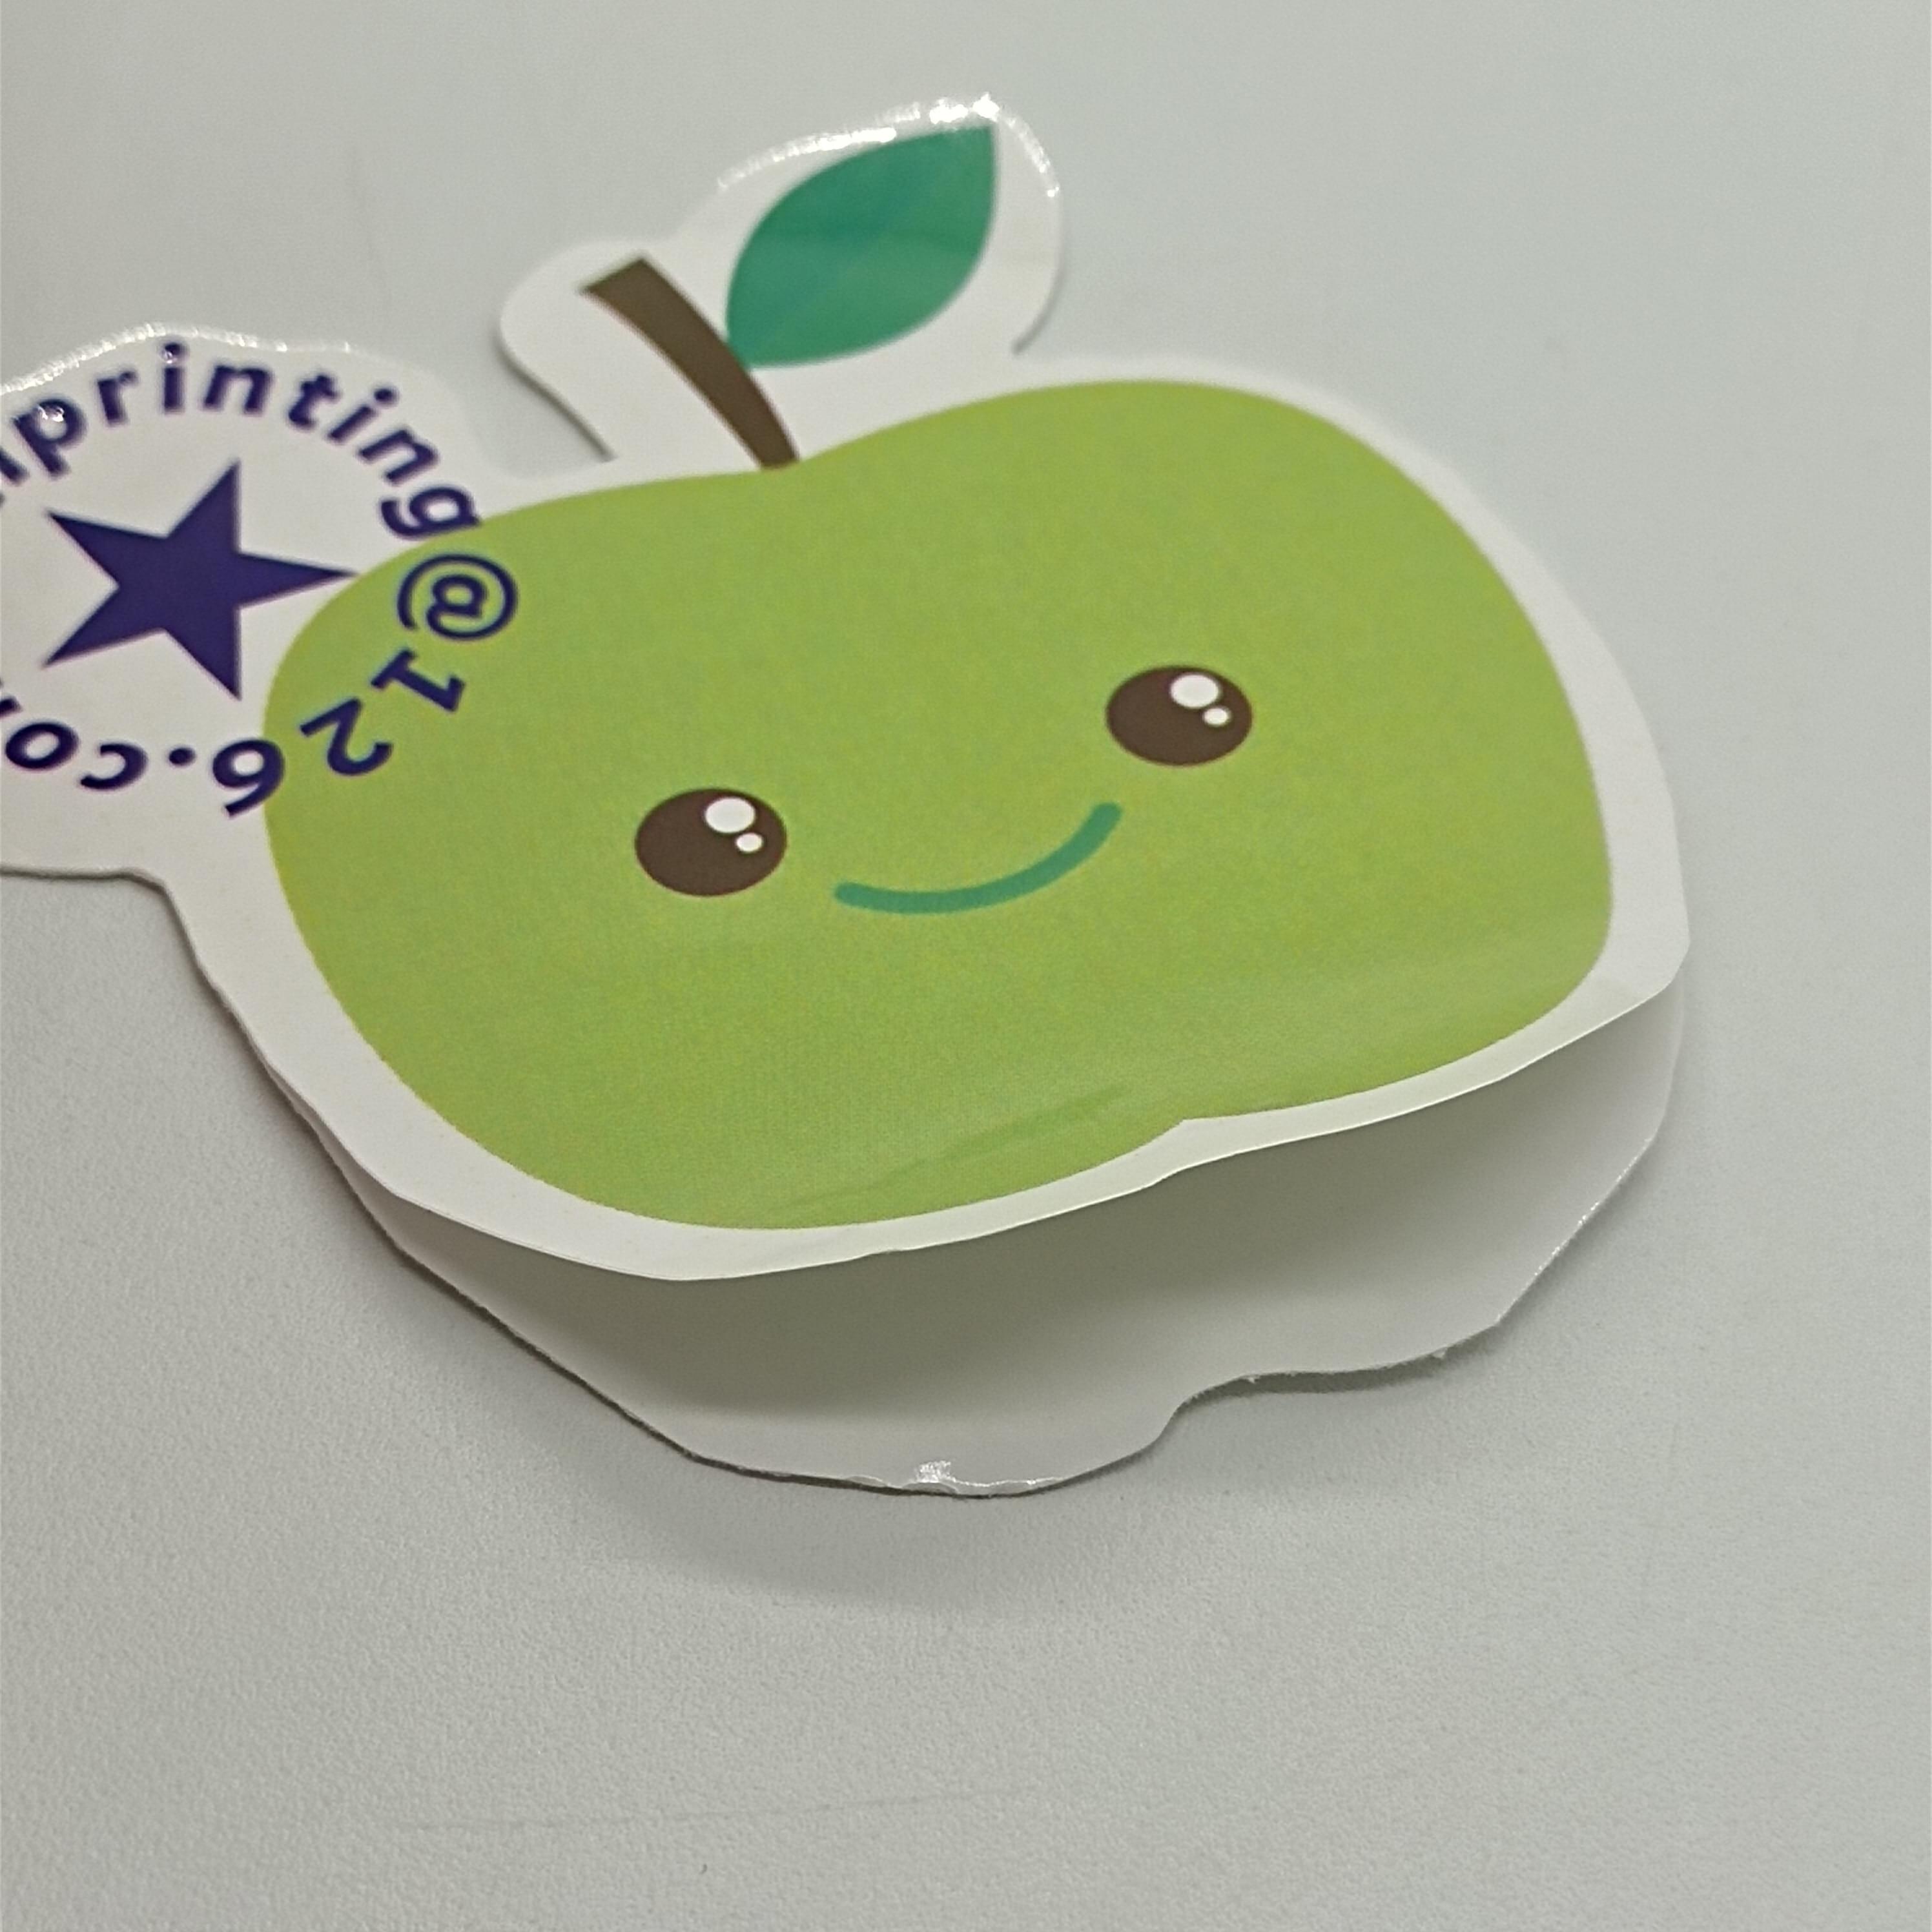 14x12/22x7.5/Green color  apple die cut sticker label printing custom